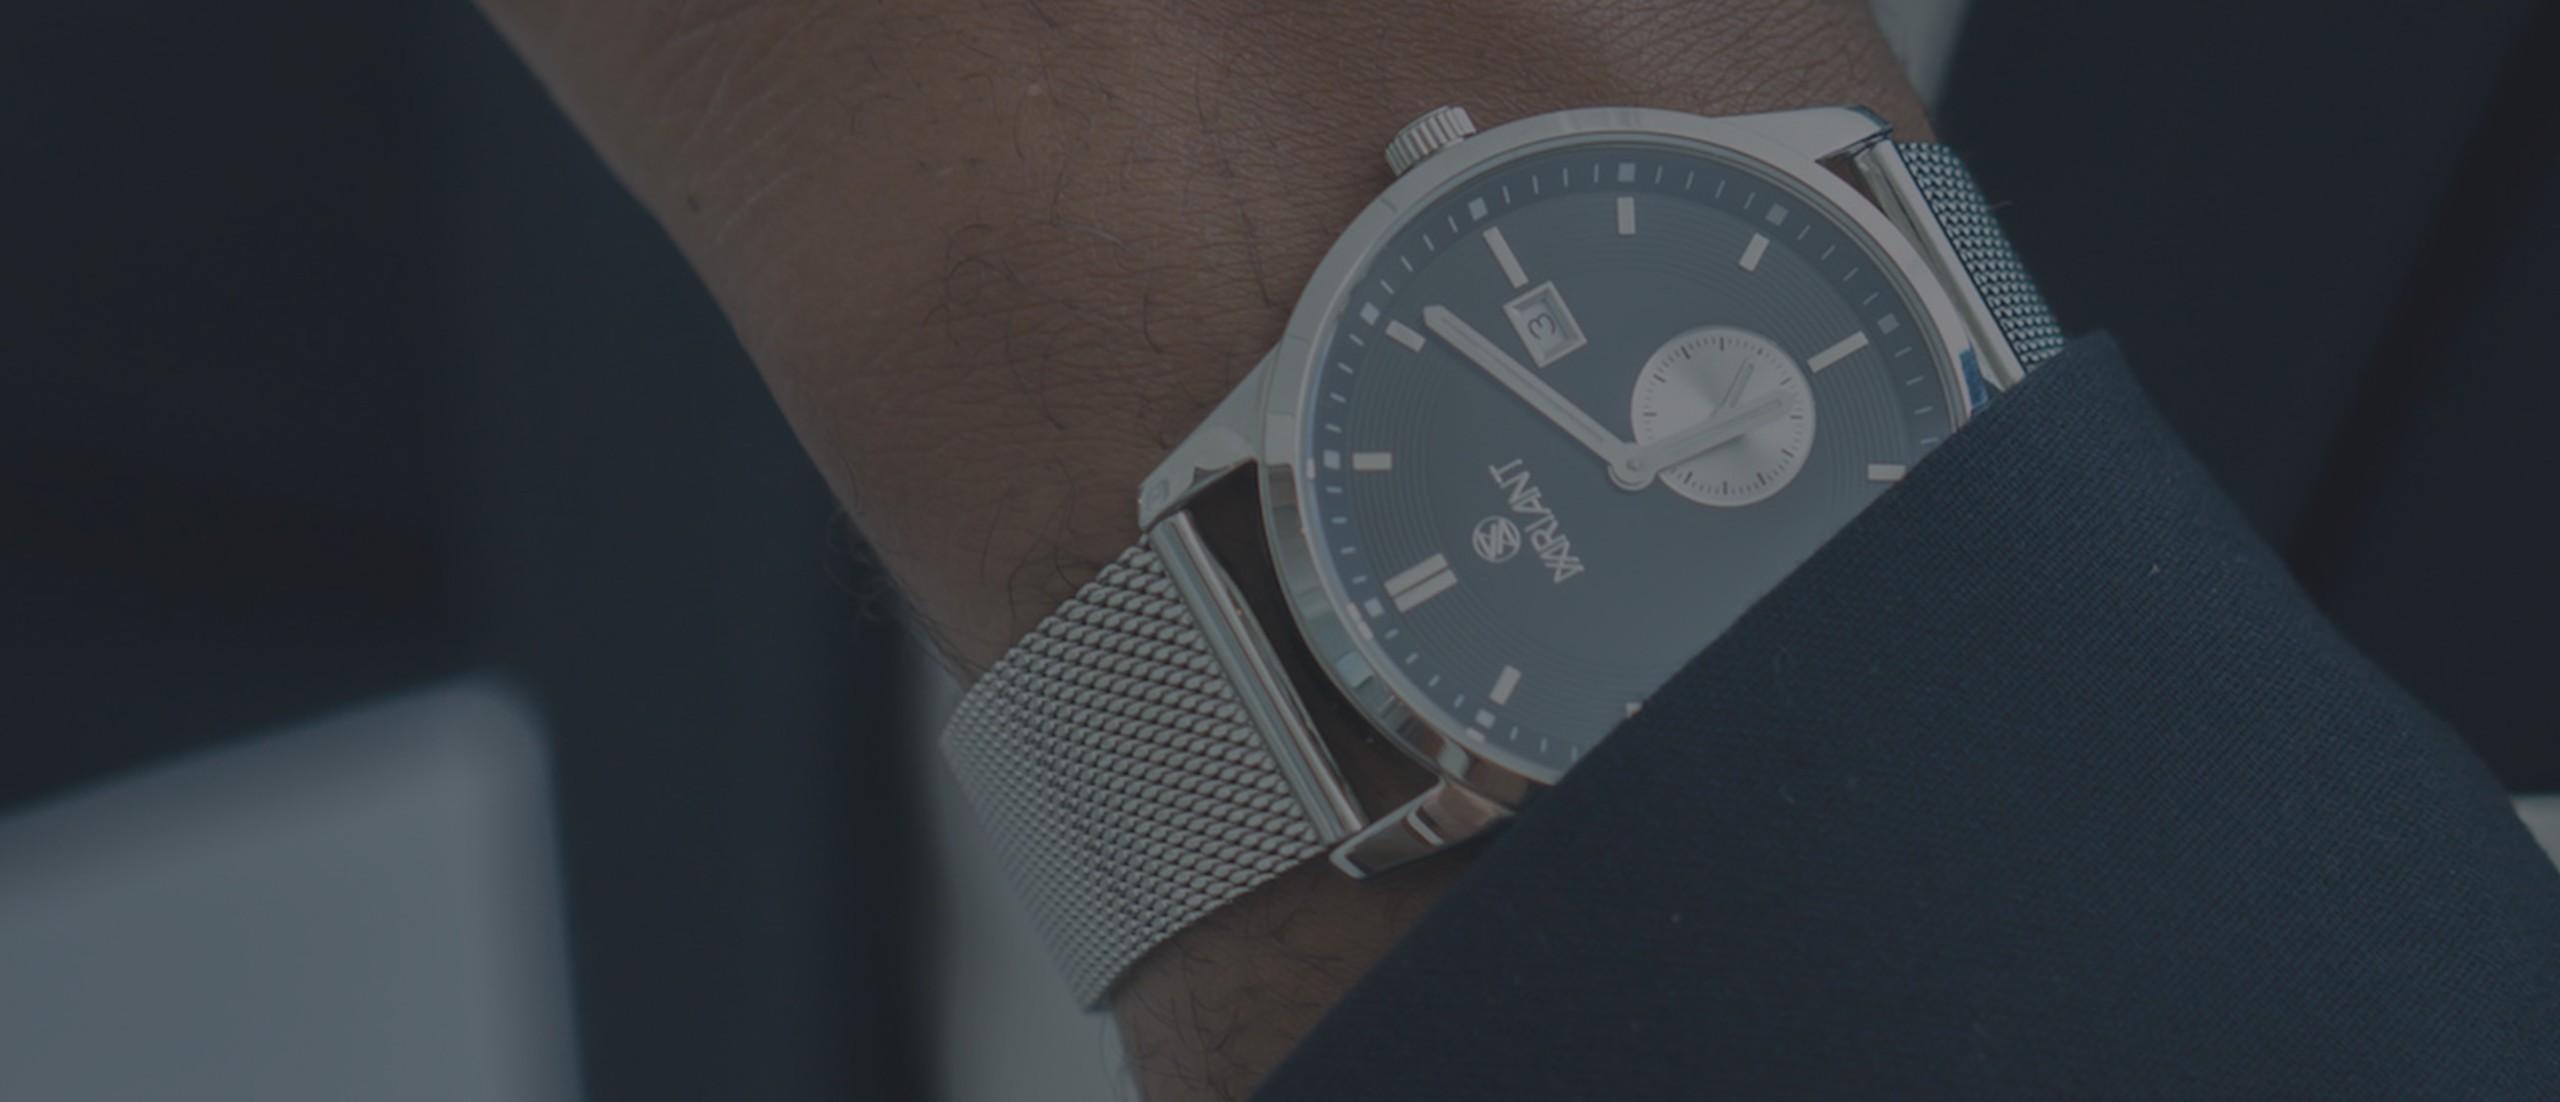 Variant Watch Co. VA-01 Premium Timepiece